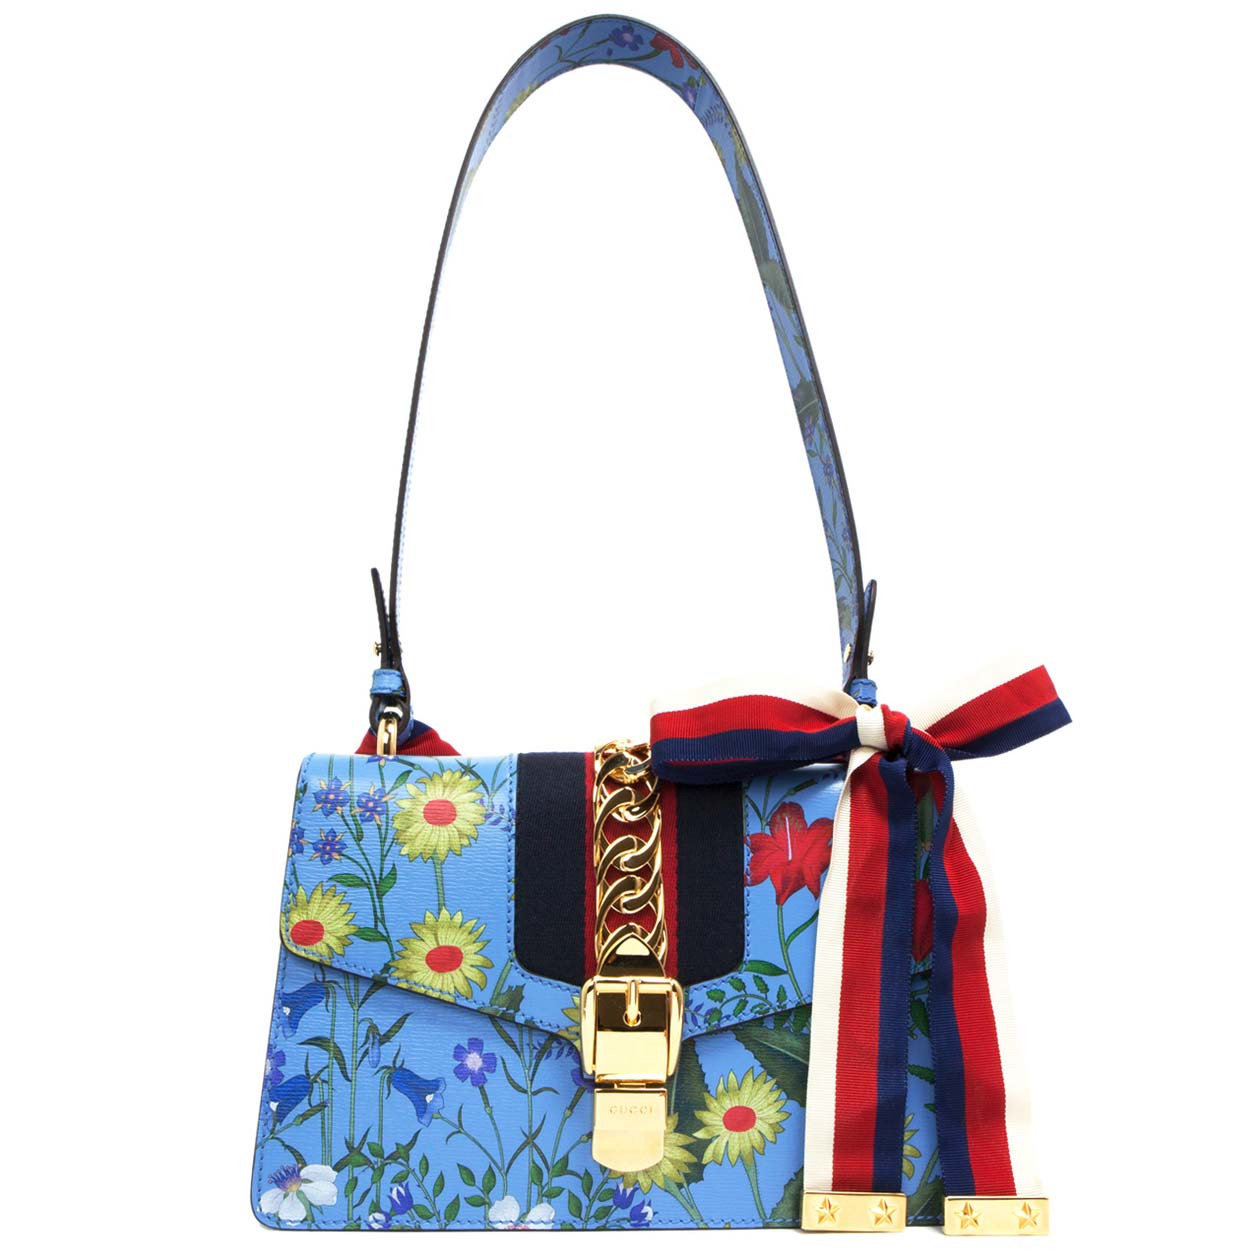 230289130 Gucci New Flora Small Sylvie Shoulder Bag - modaselle